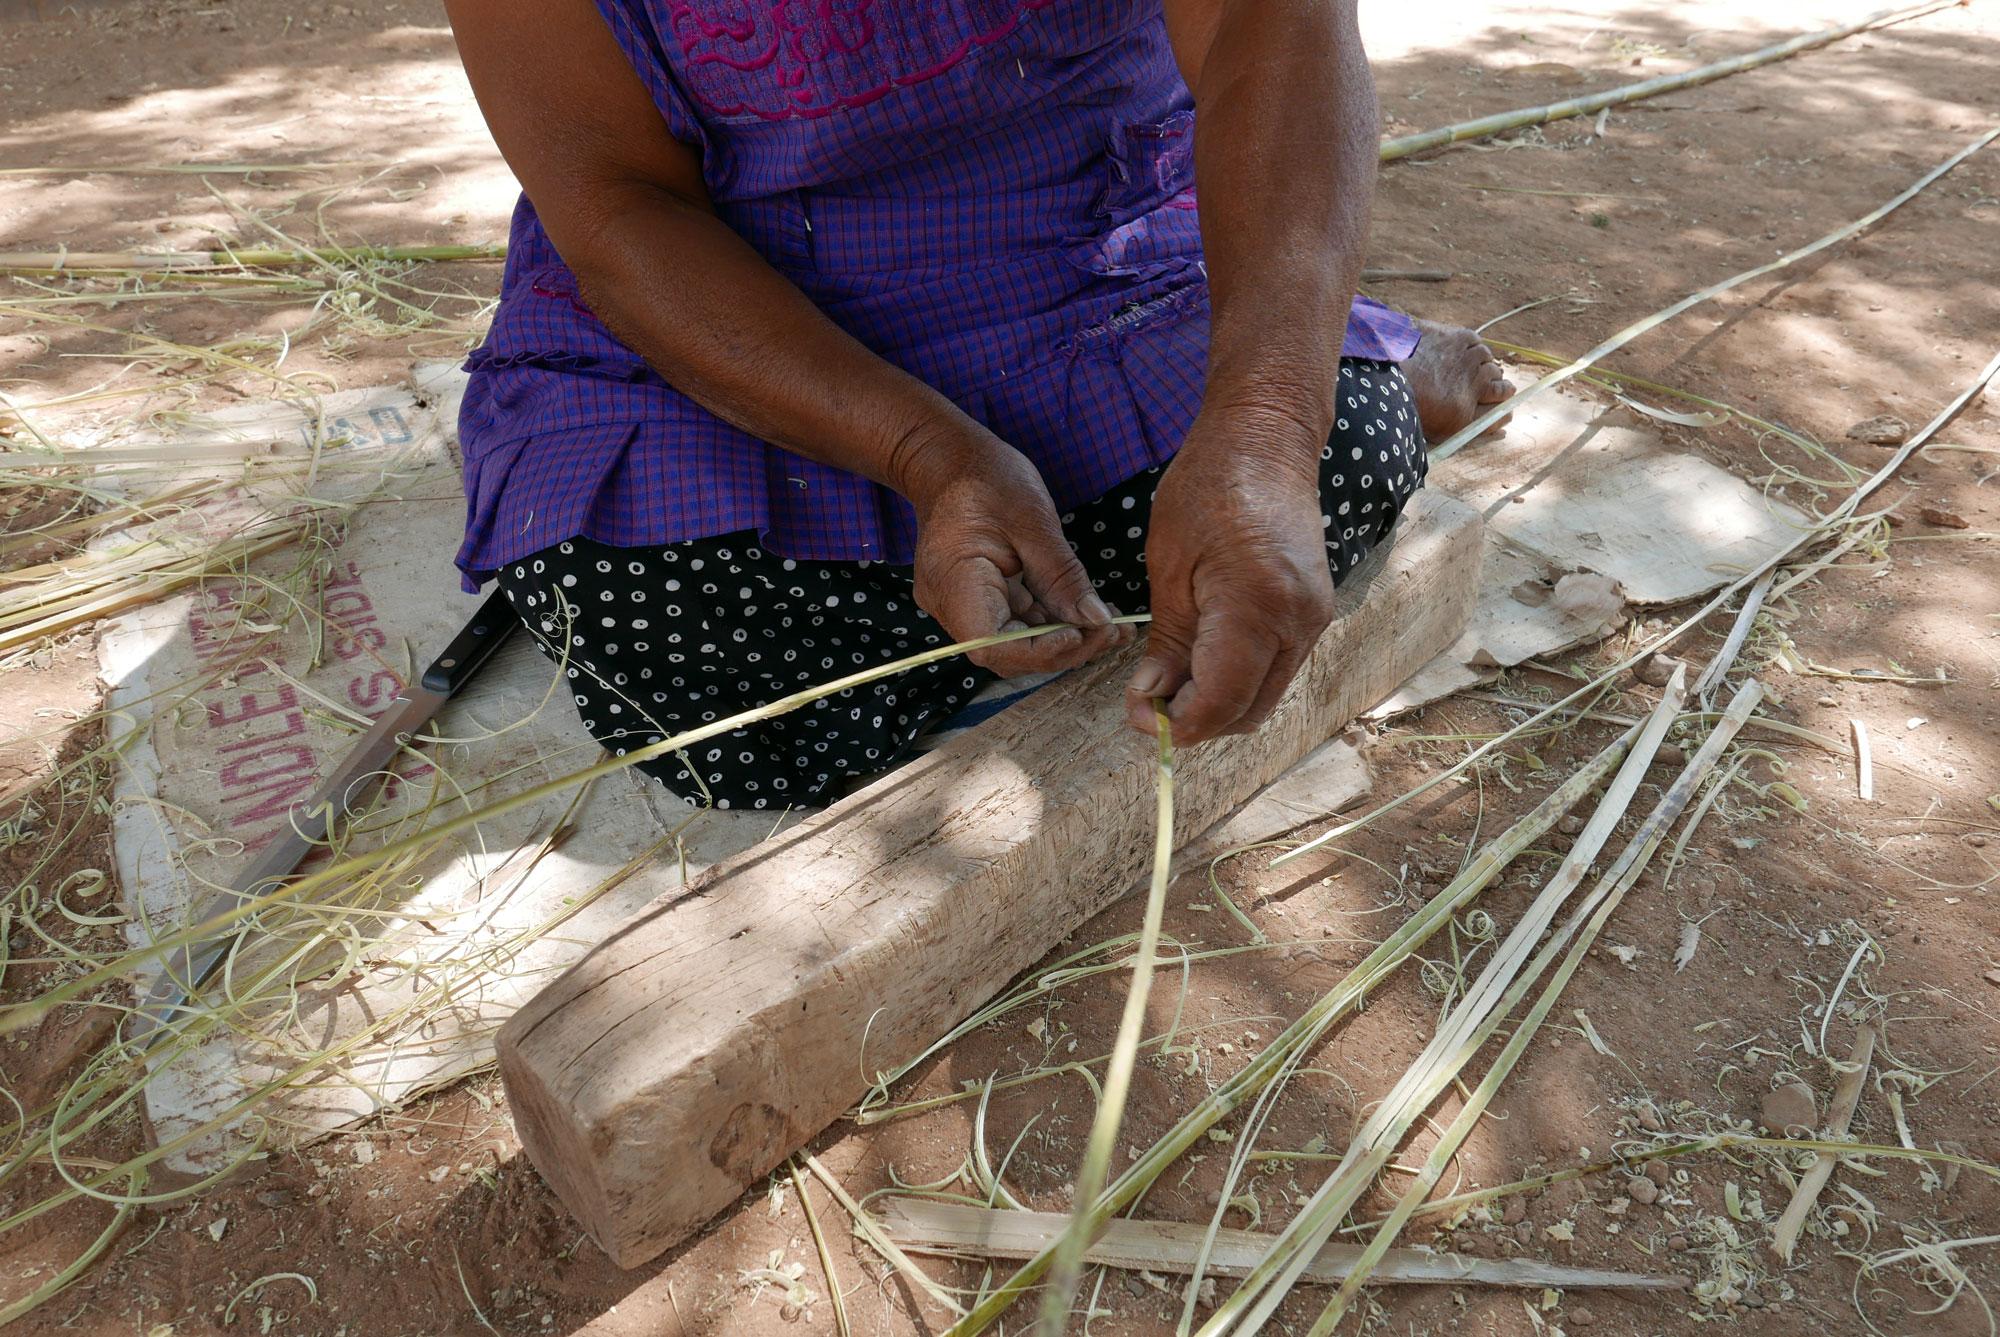 Artisan Splitting Carrizo Reeds Ready for Weaving Baskets in Oaxaca Mexico - www.nidocollective.com/carrizoweaving #carrizo #canastascarrizo #basketweaving